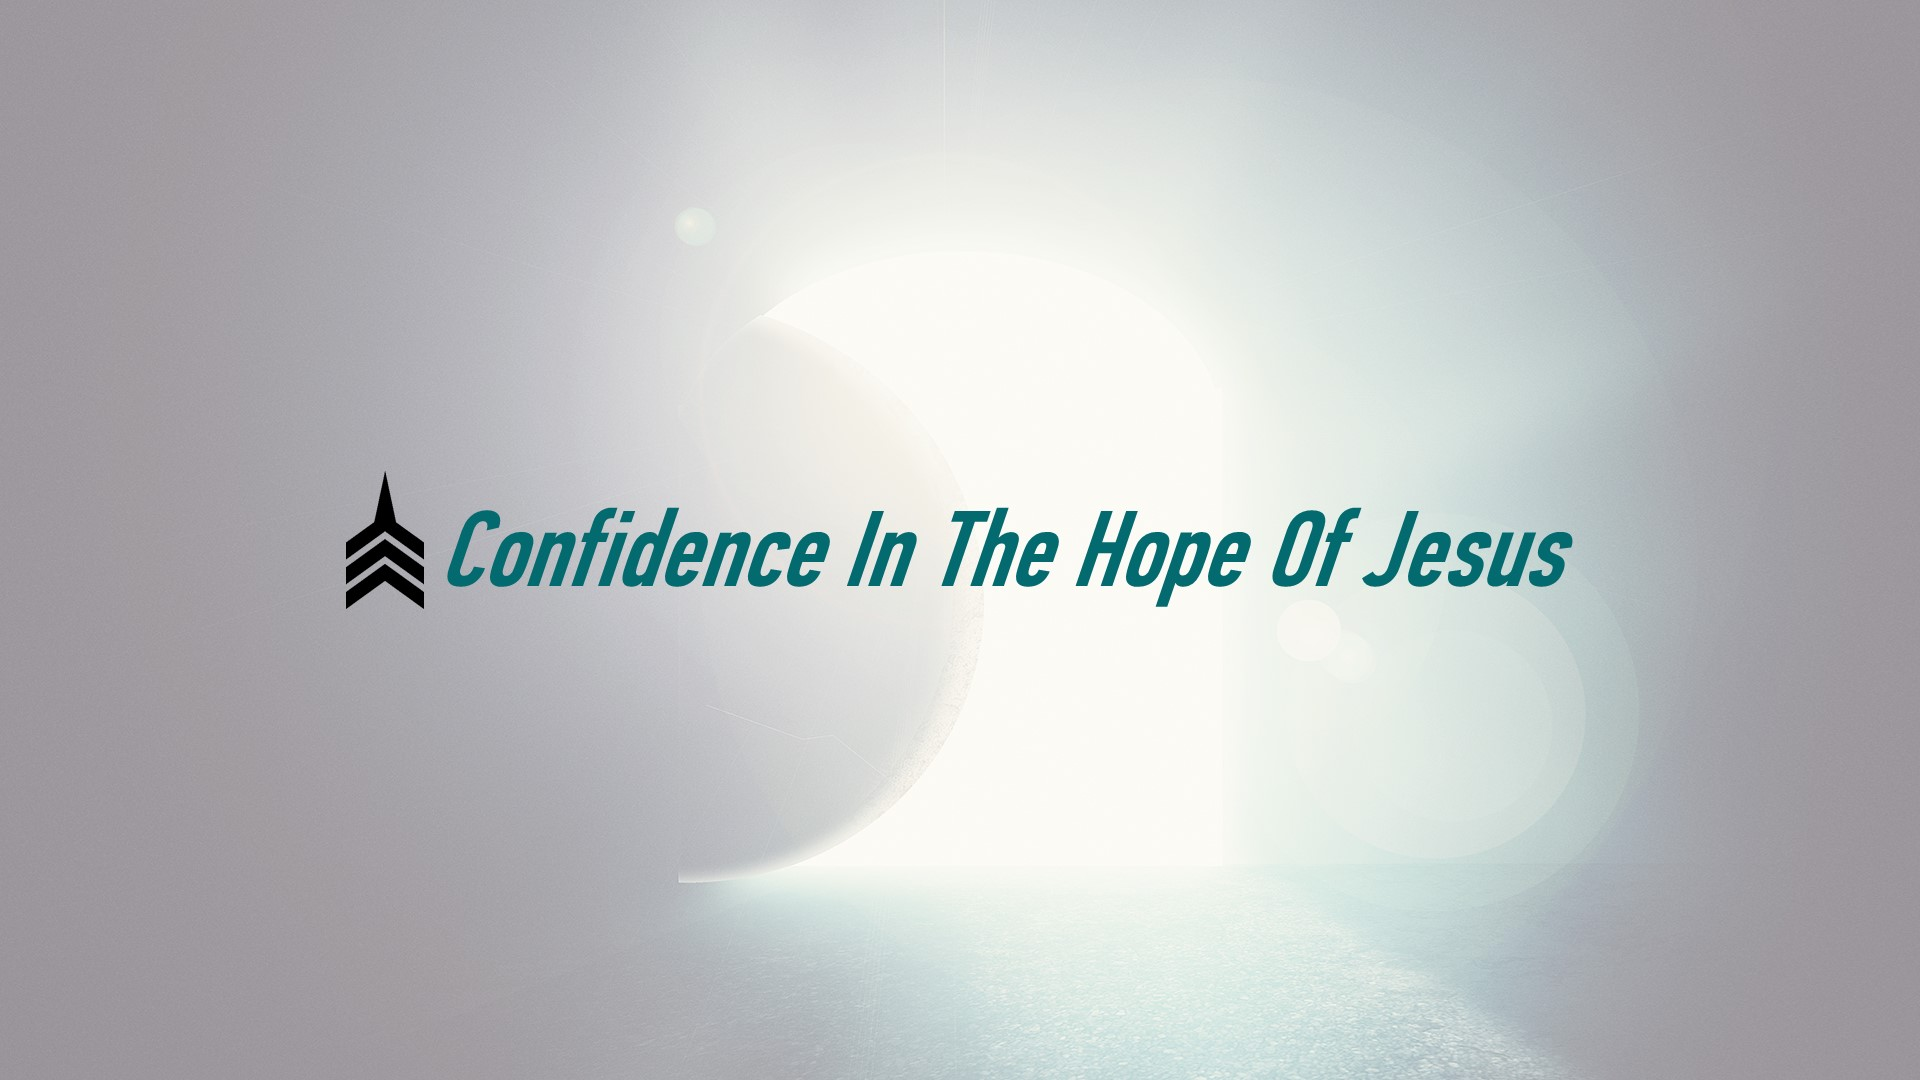 20180722 Confidence In The Hope Of Jesus.JPG